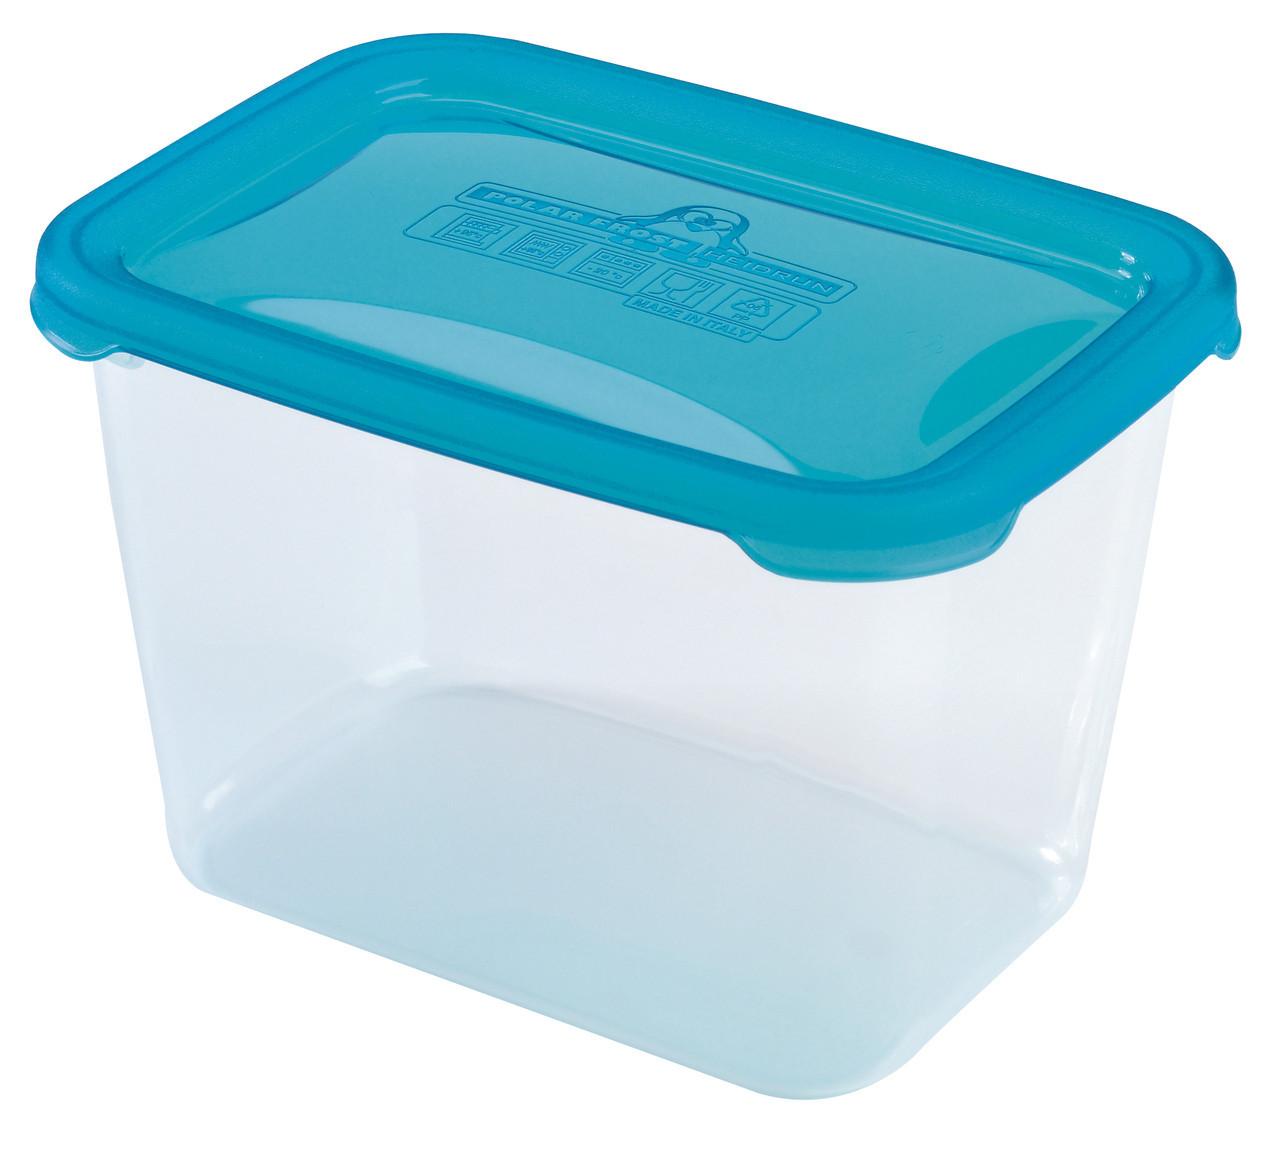 Контейнер для хранения в морозилке 2,4л Heidrun PolarFrost 19,5*14.5*12,7см (HDR-1752)